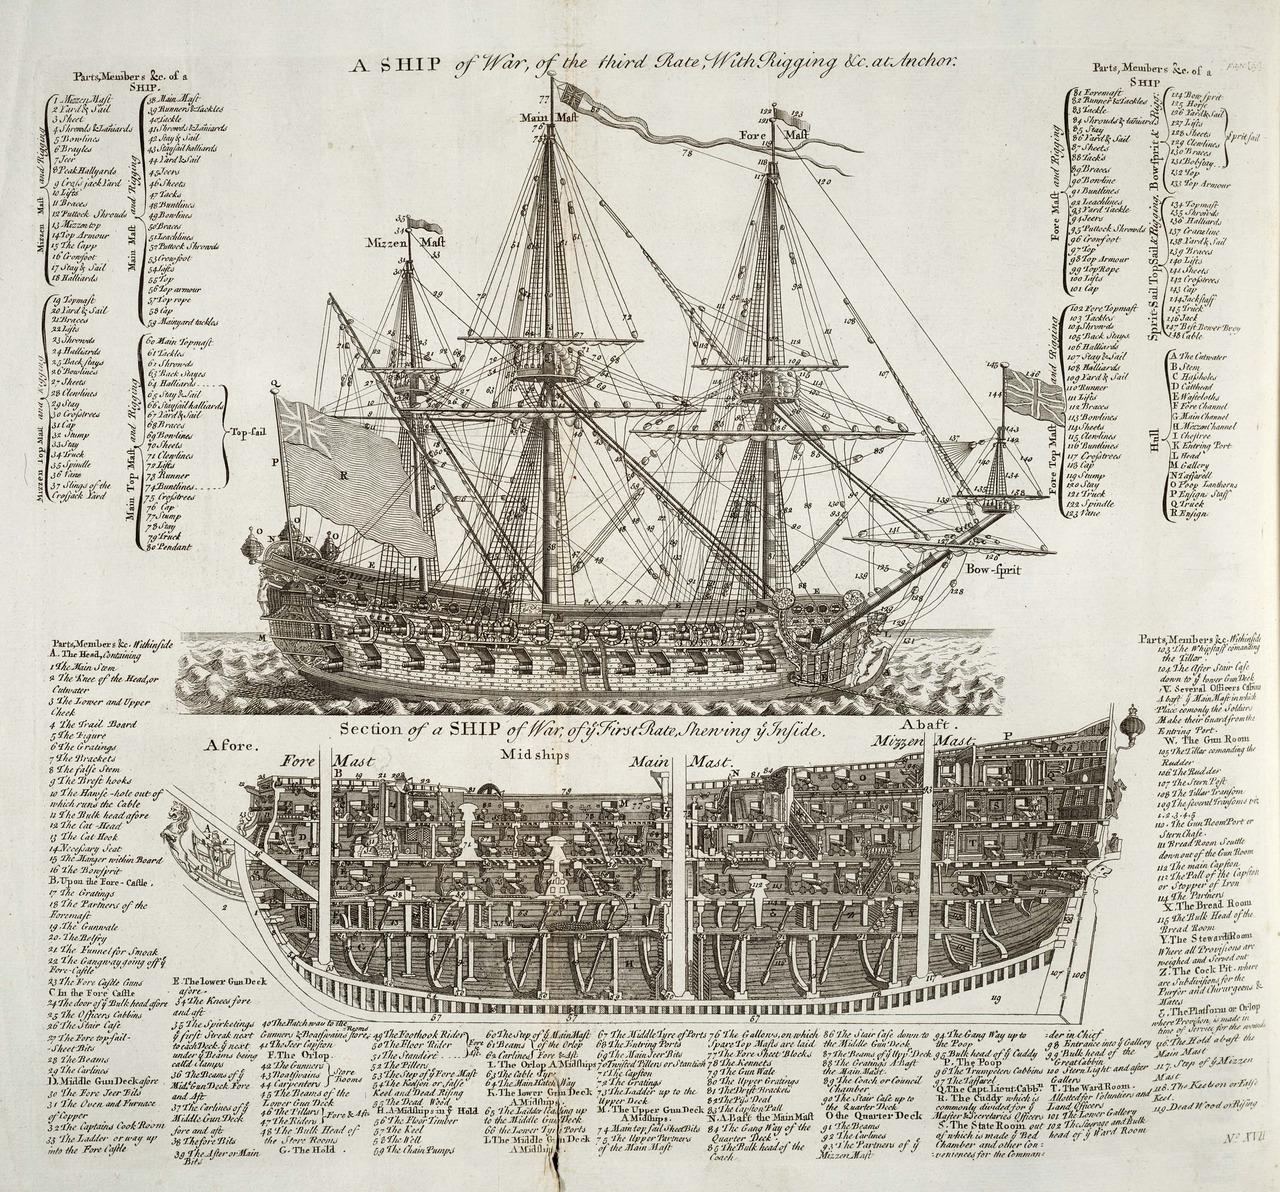 Crass-section of a ship of war atanchor